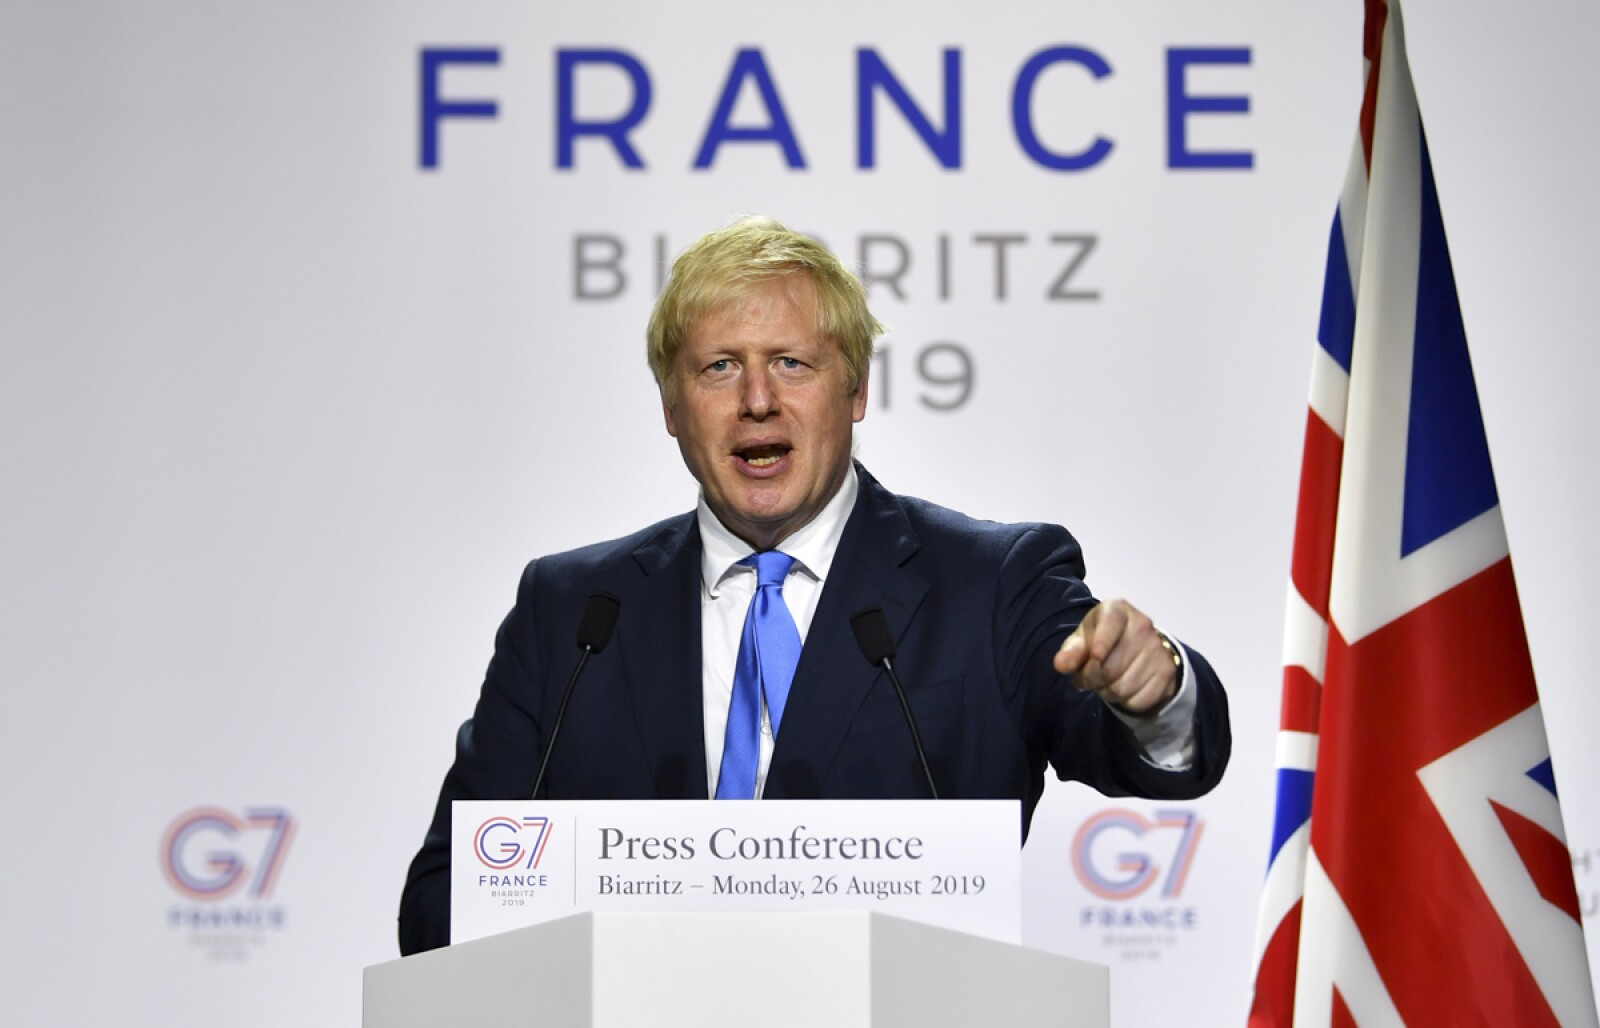 G7 Boris Johnson